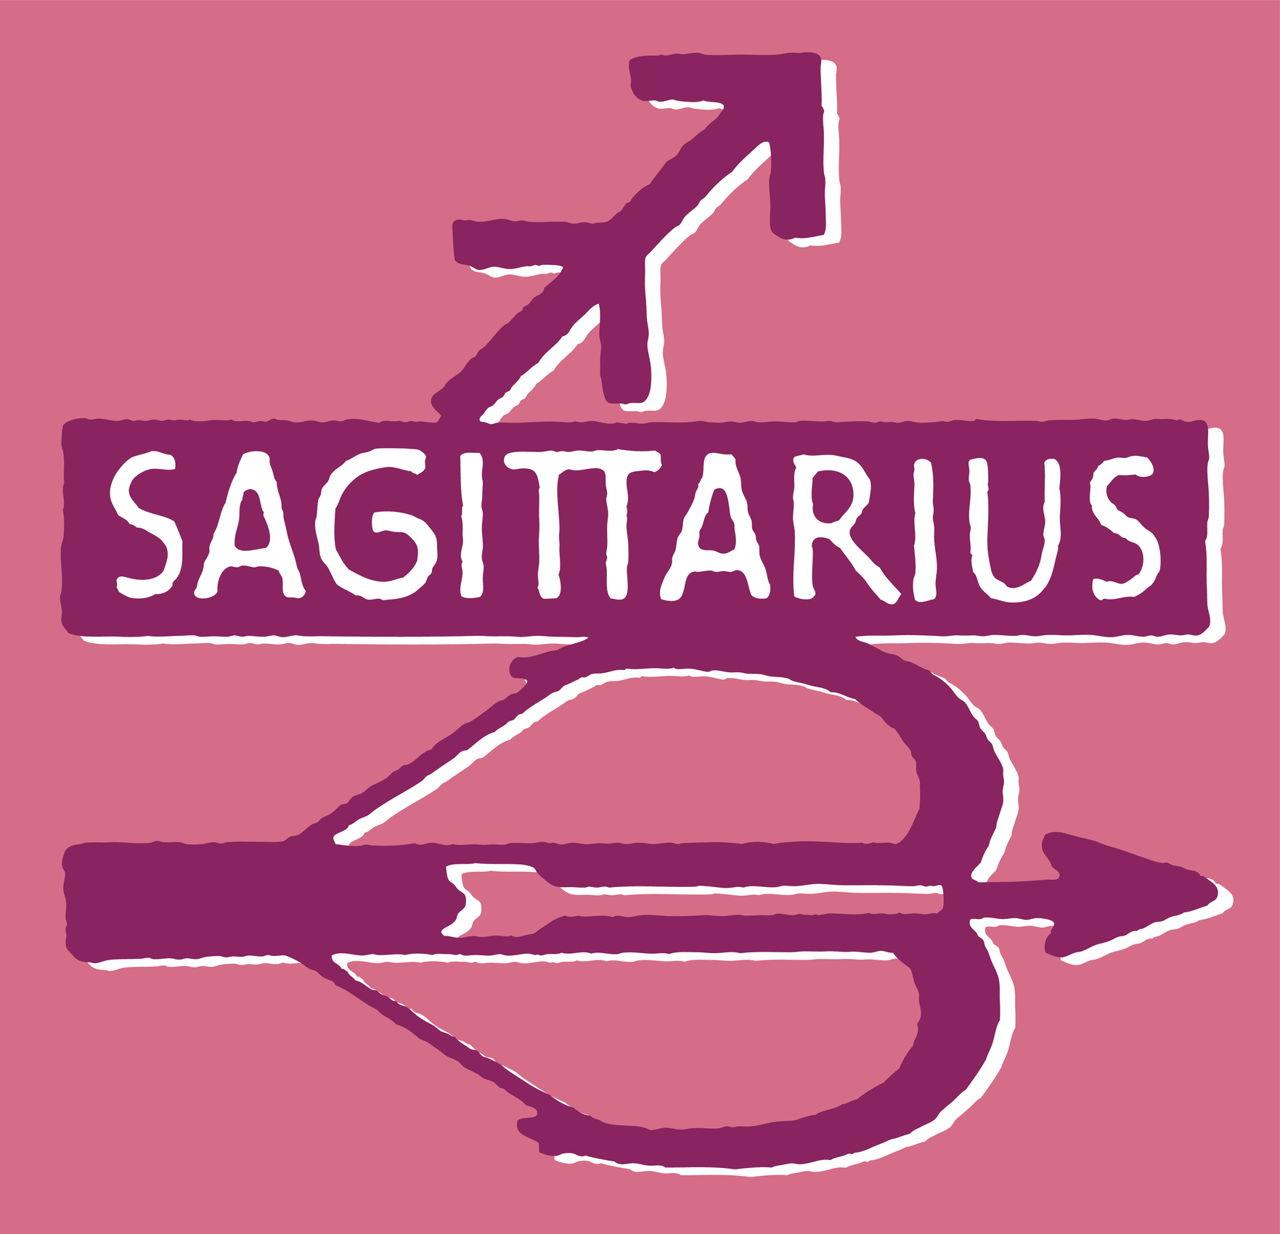 sagittarius best friend